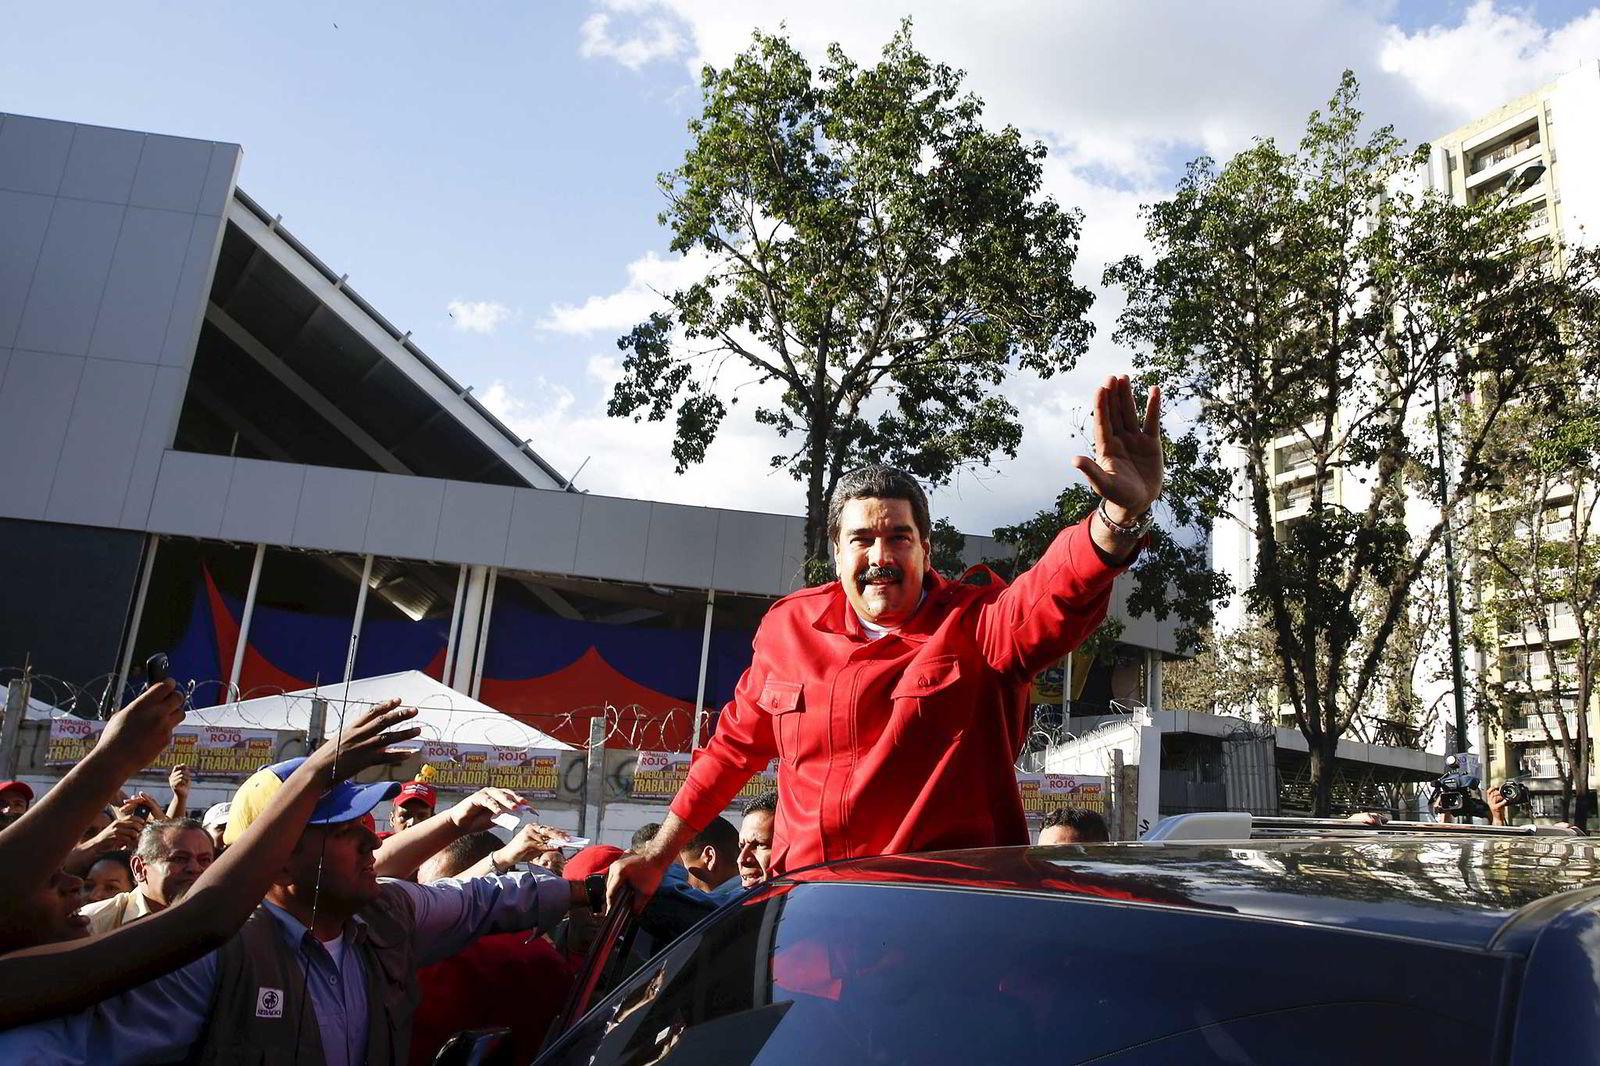 Venezuelas president Nicolas Maduro her under en offentlig opptreden i hovedstaden Caracas i desember i fjor. Foto: REUTERS/Carlos Garcia Rawlins/NTB Scanpix